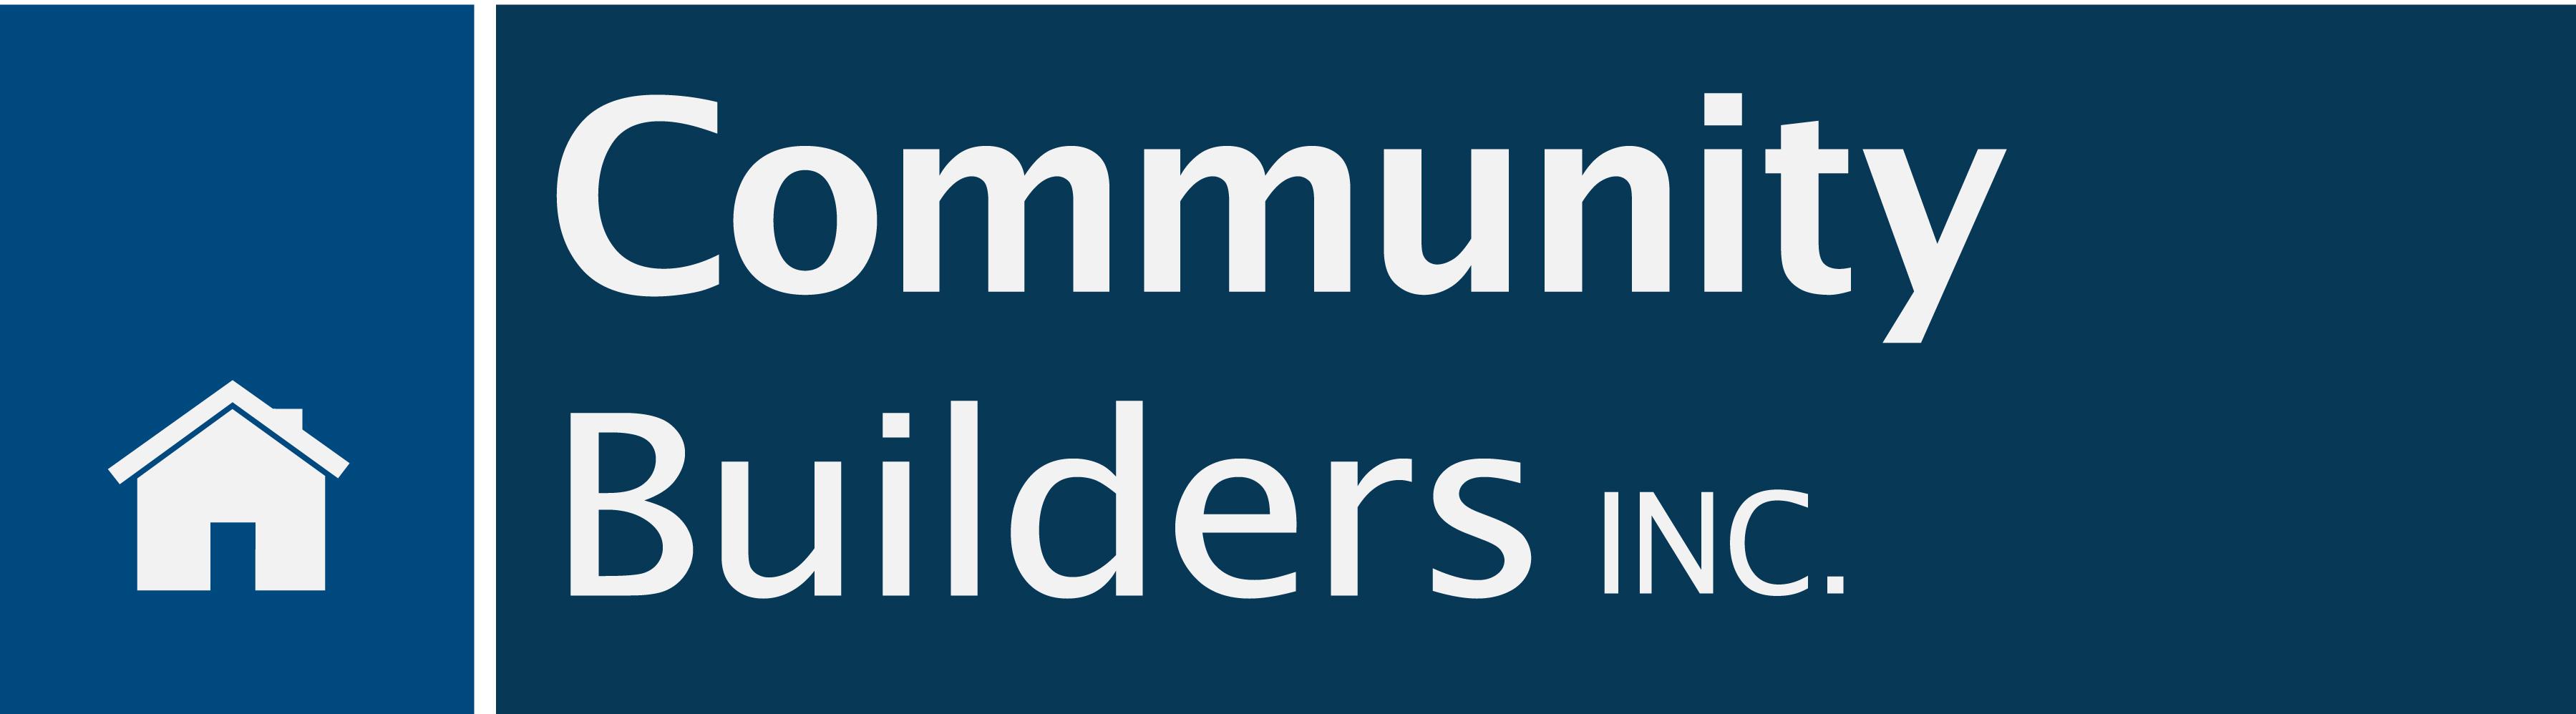 Community Builders Logo - remade